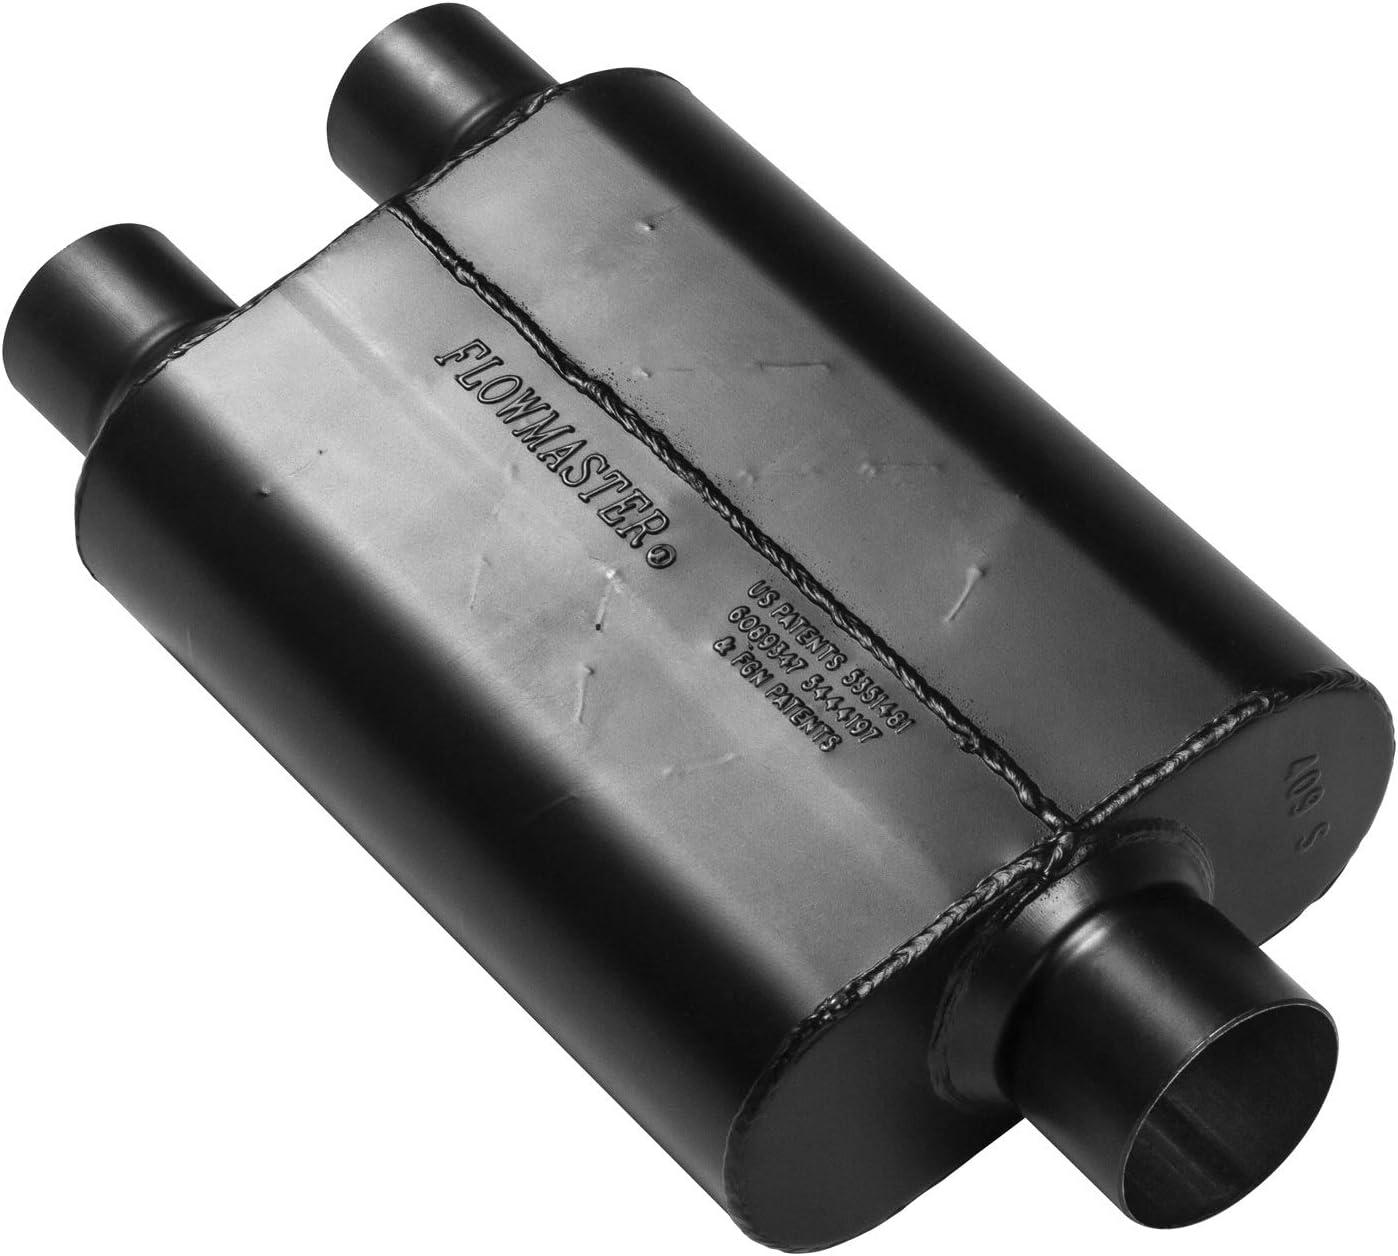 2.50 Dual Inlet // 3.00 Center Outlet Aggressive Sound Exhaust Muffler 40 Series Muffler Flowmaster 425403 40 Series Muffler Aggressive Sound,Black 2.50 Dual In // 3.00 Center Out